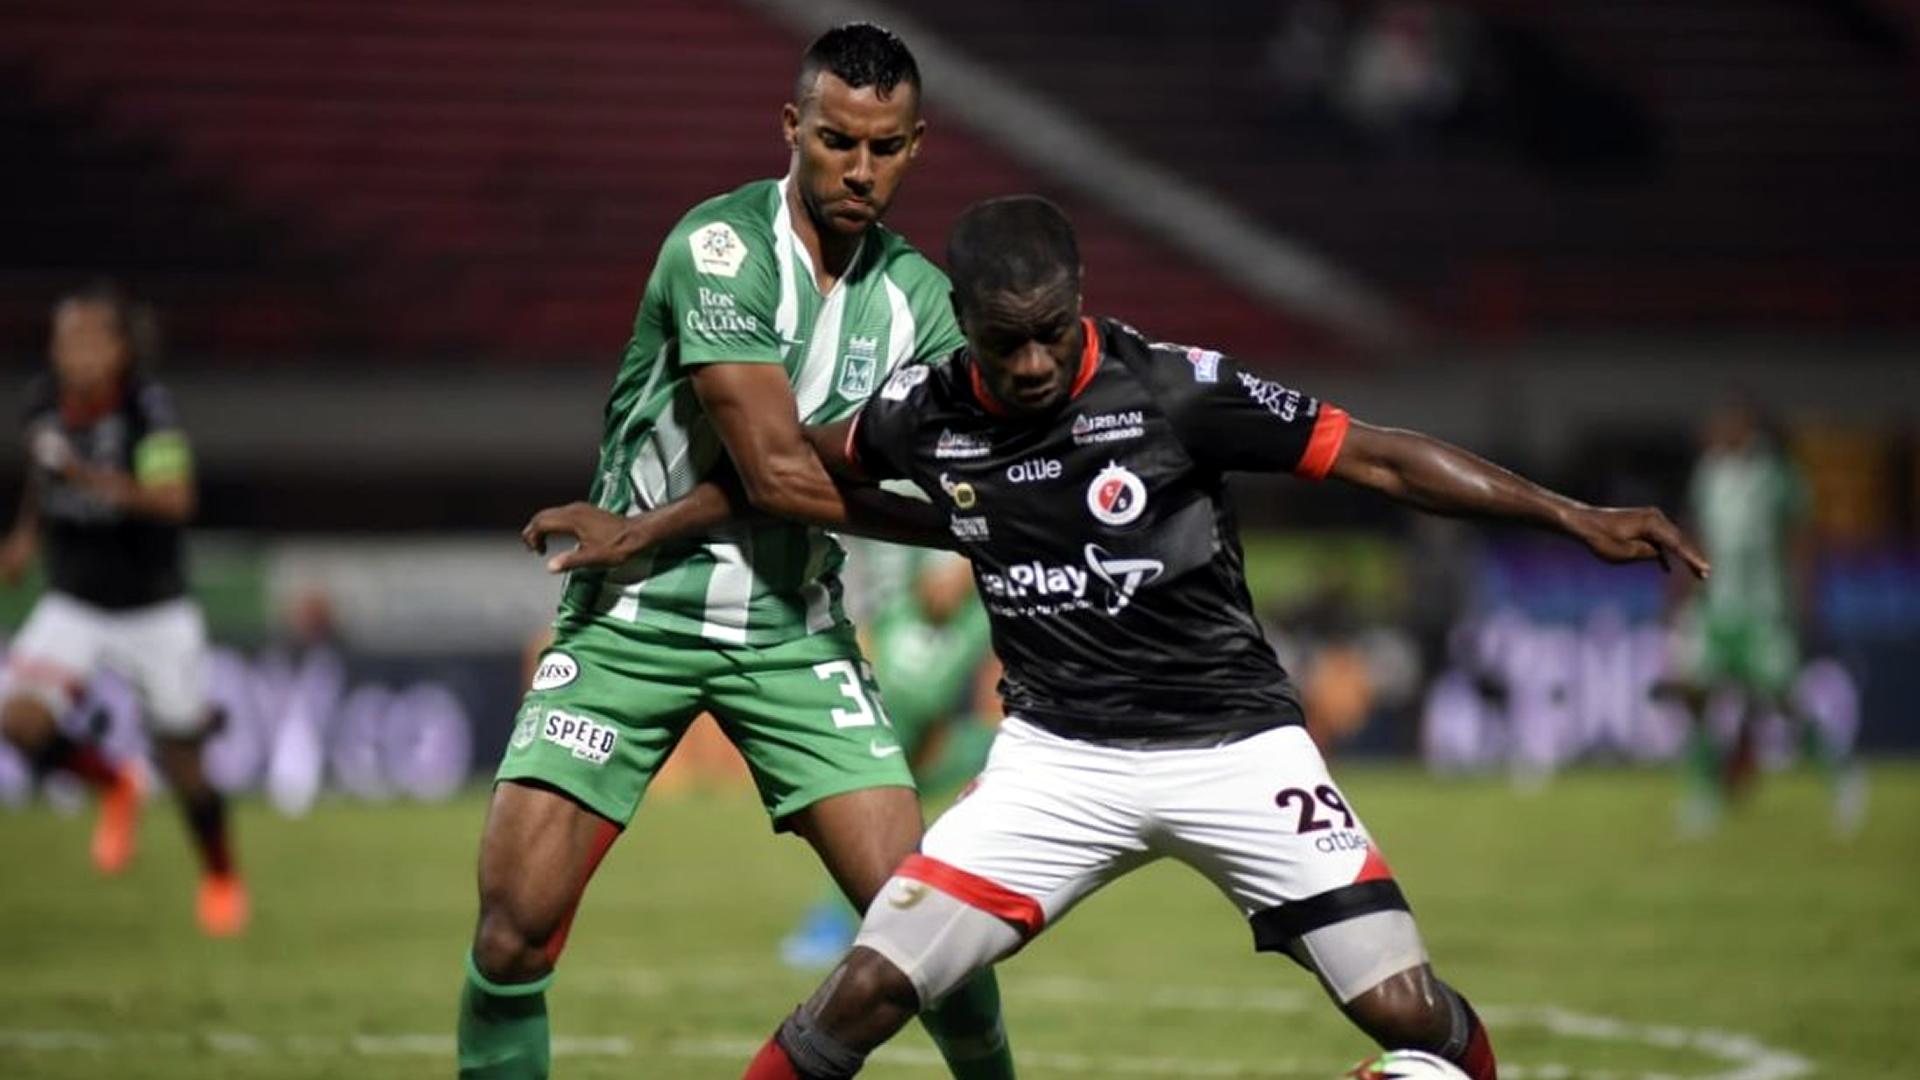 Cristian Mafla Atlético Nacional 2019